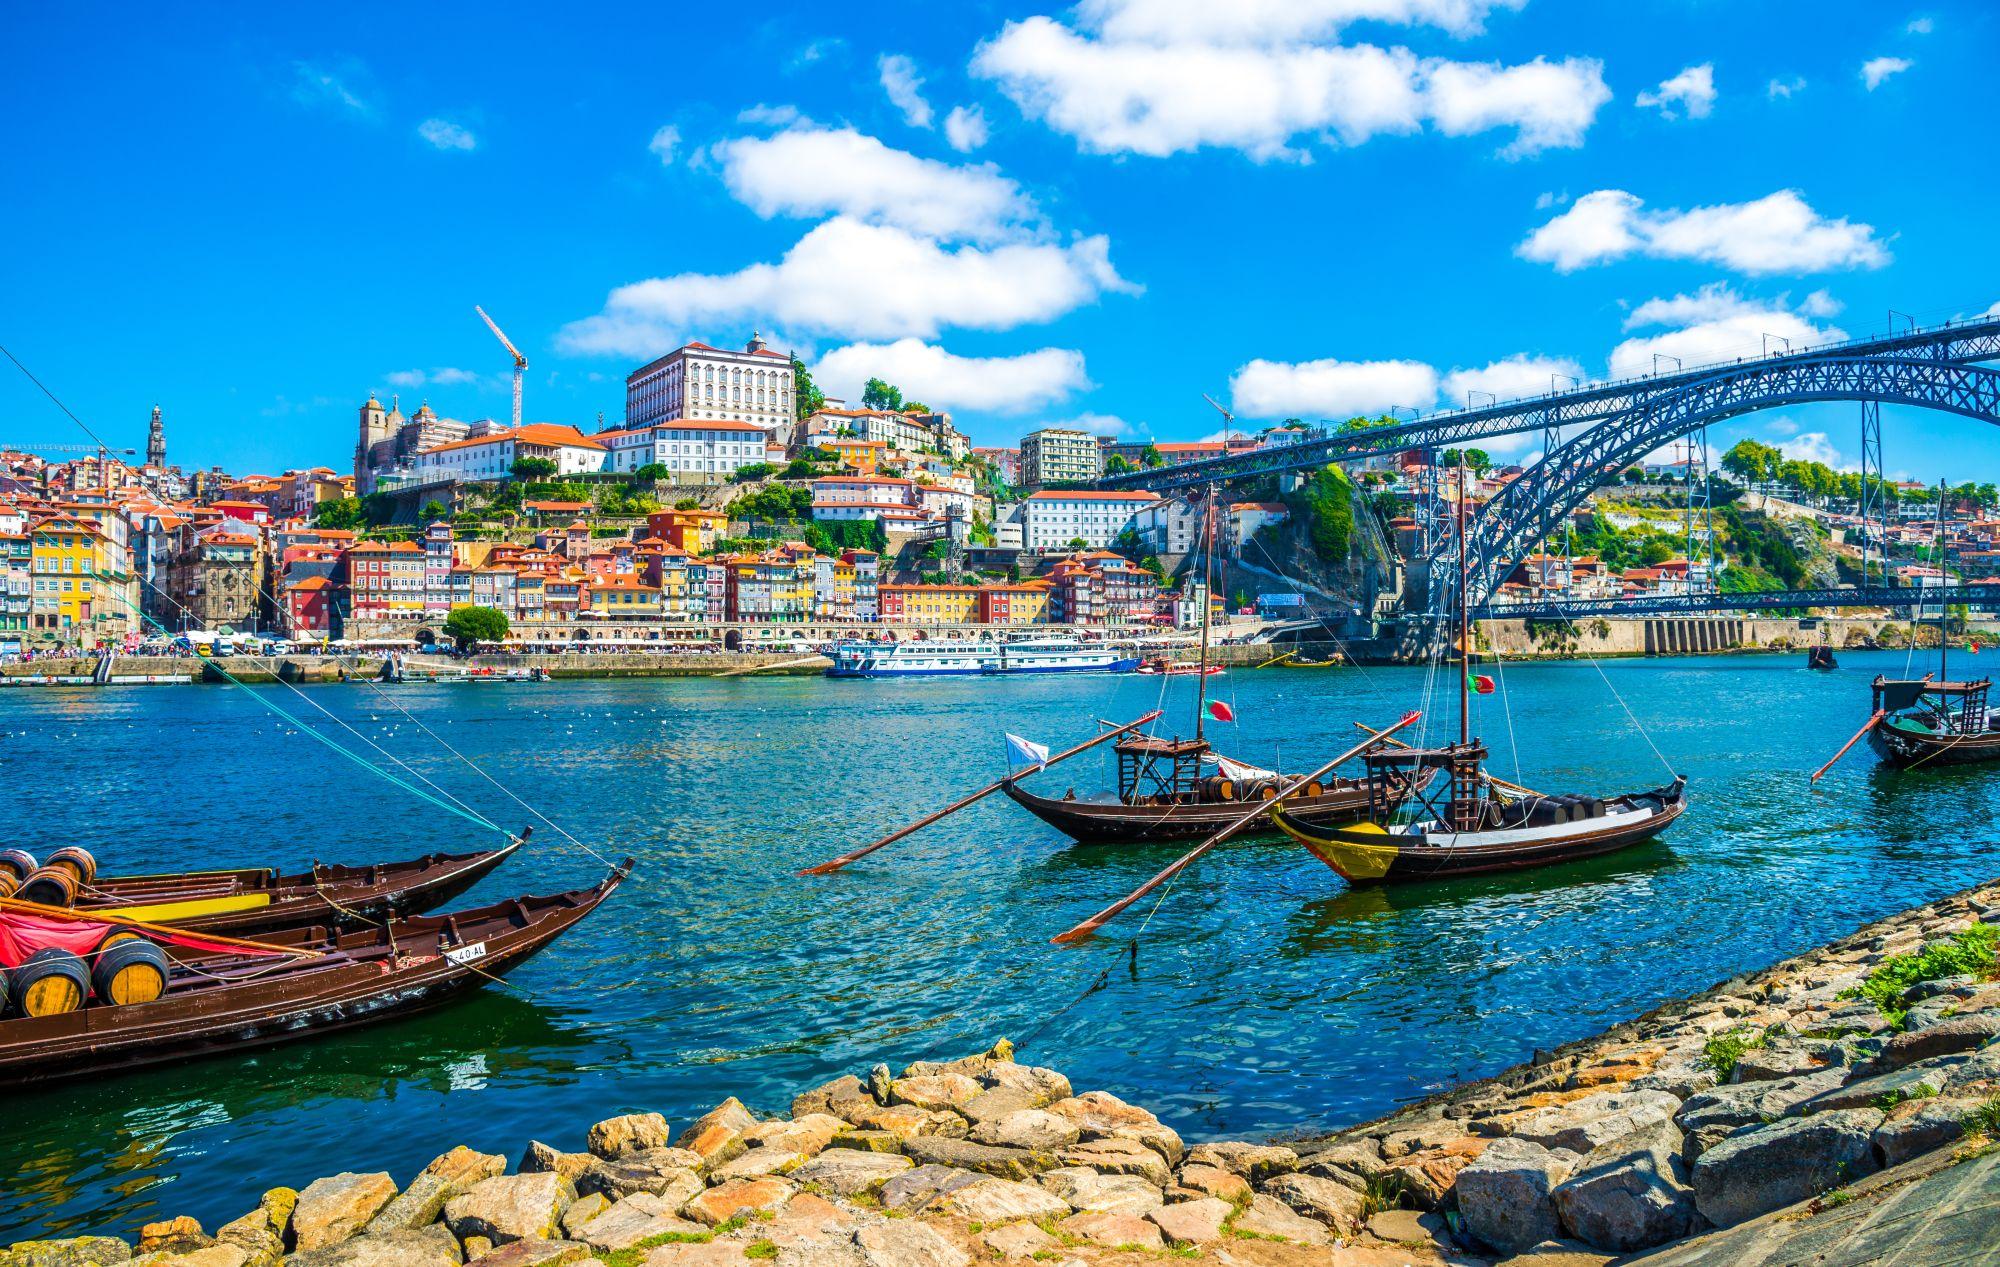 Porto widok rzeki i mostu